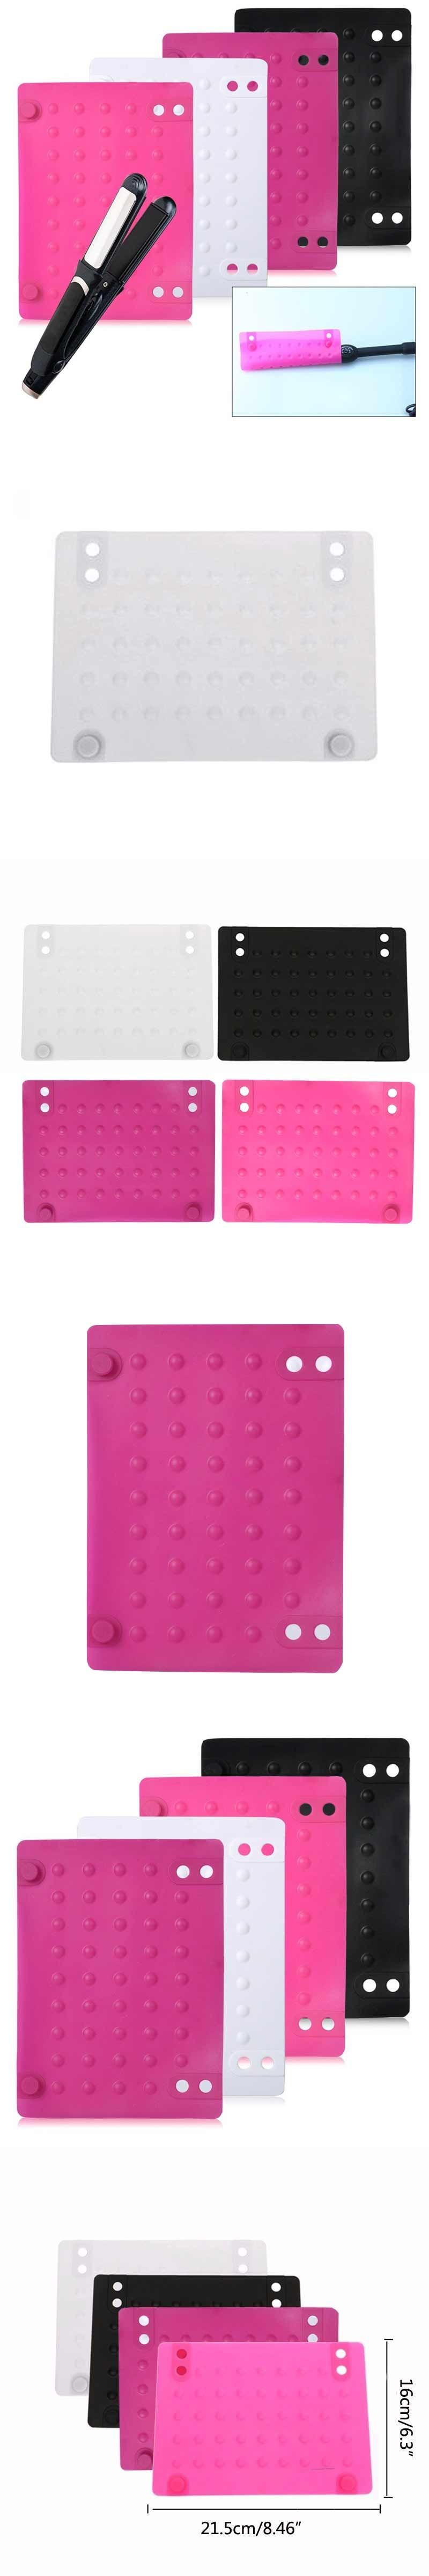 zeal mats trivet hot silicone cks previous square kitchen resistant cream cookware next mat heat